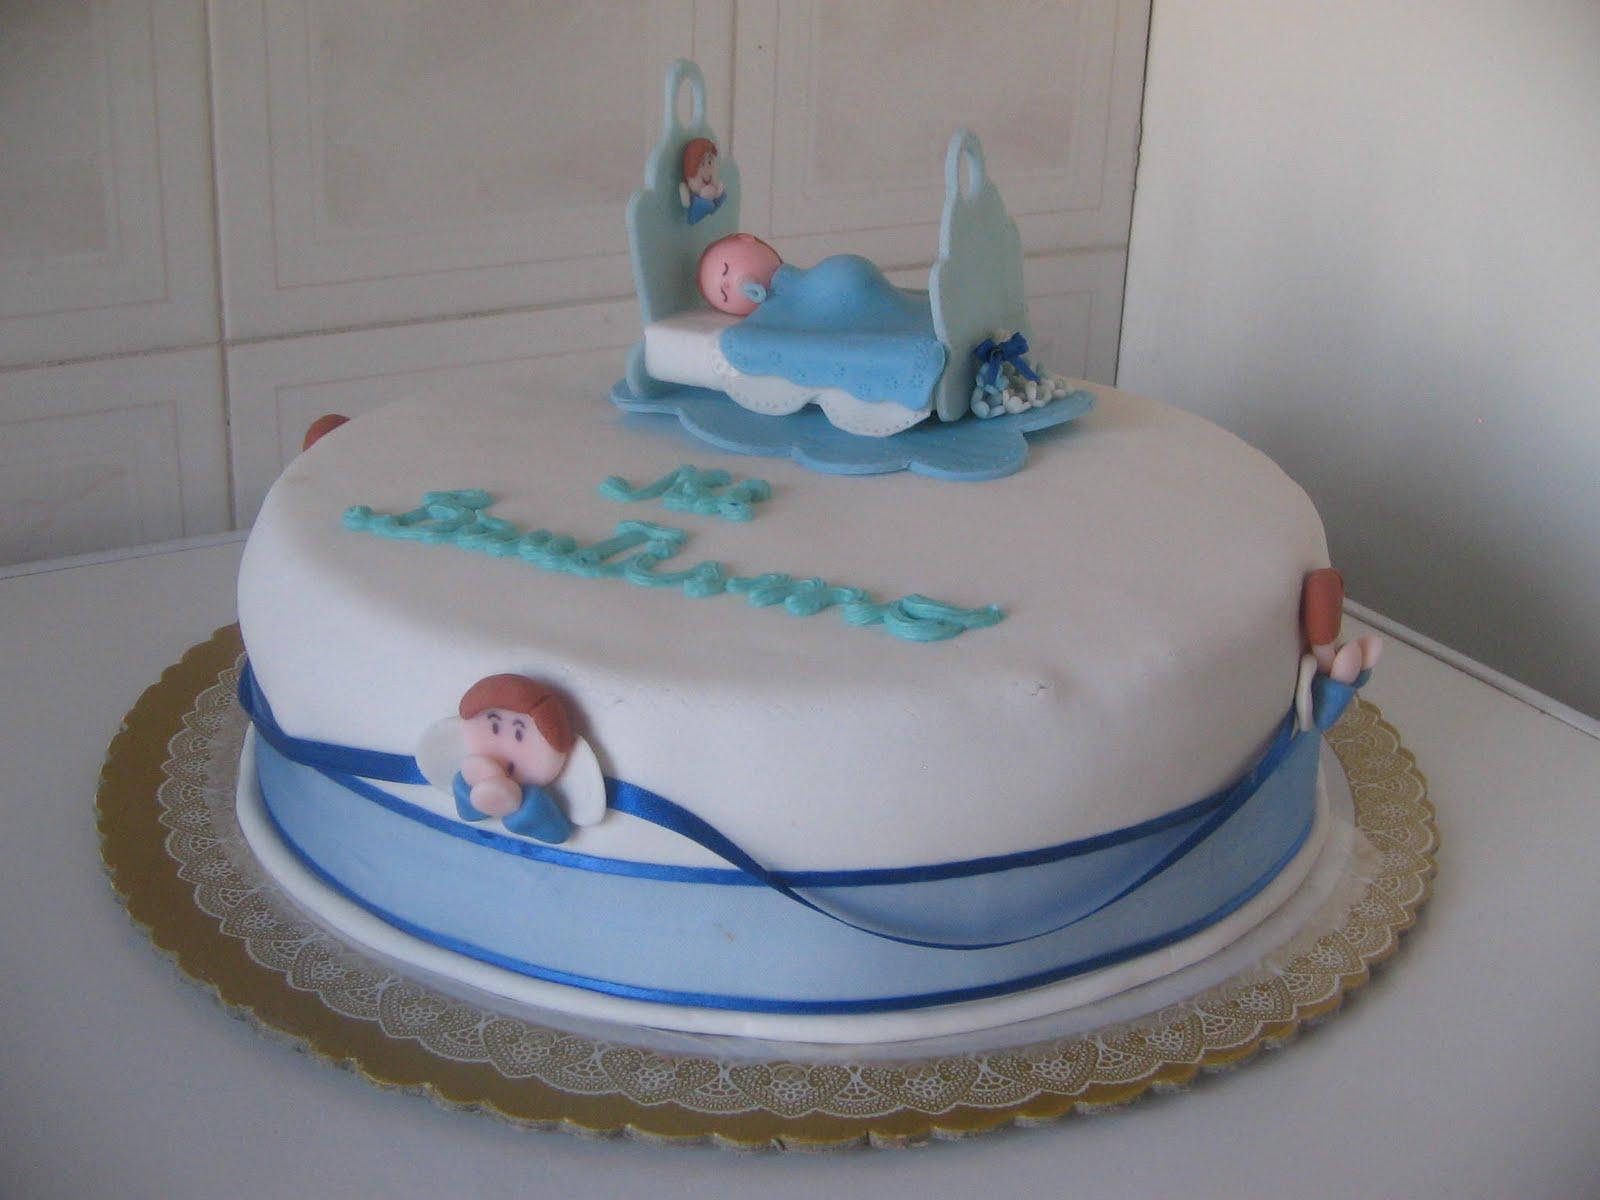 http://4.bp.blogspot.com/-8NM2EdIvlK4/TeqWU_B4laI/AAAAAAAAAWk/R-GB9msjzek/s1600/torta+bautismo+angelitos+varon.JPG